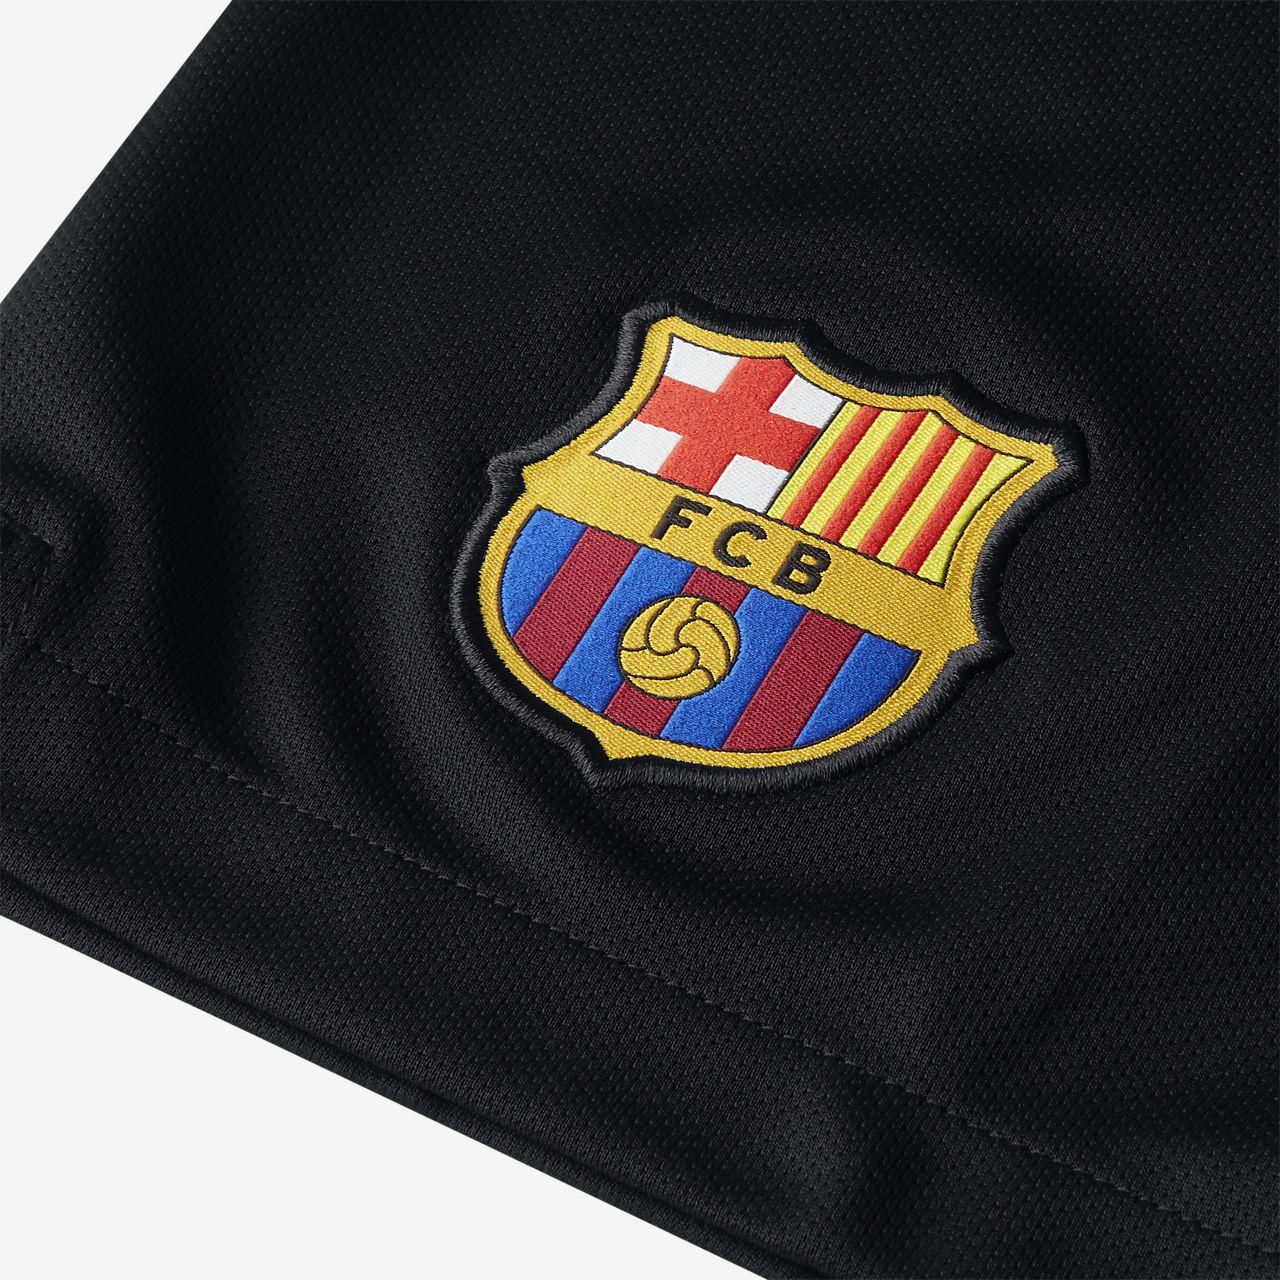 43671b4522b 2018 19 FC Barcelona Stadium Goalkeeper Older Kids  Football Shorts ...